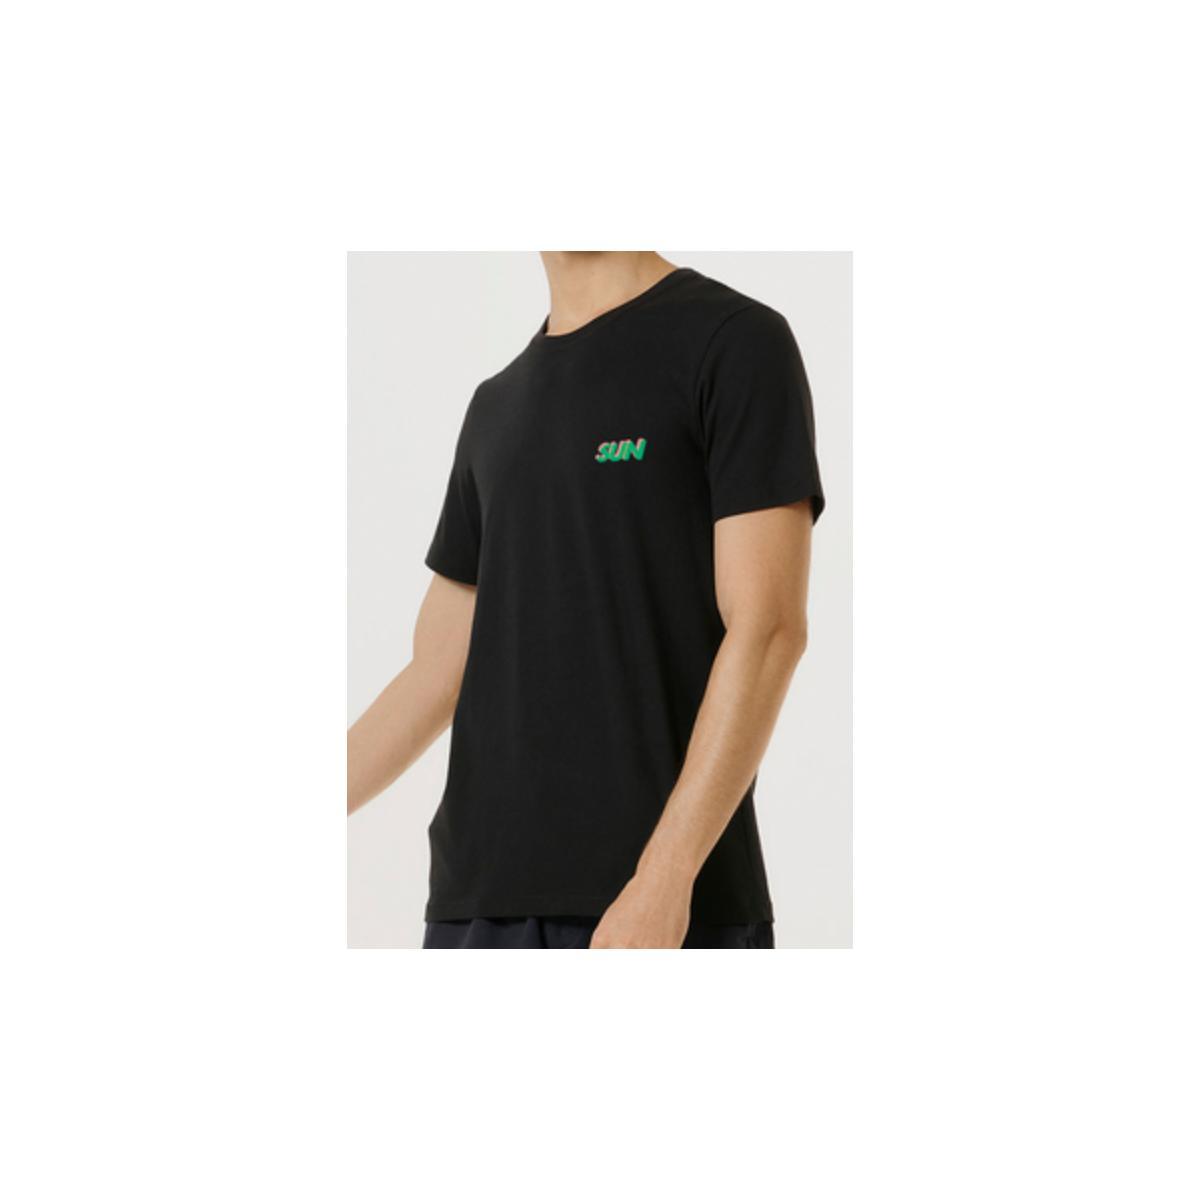 Camiseta Masculina Hering 4fdp N10en Preto